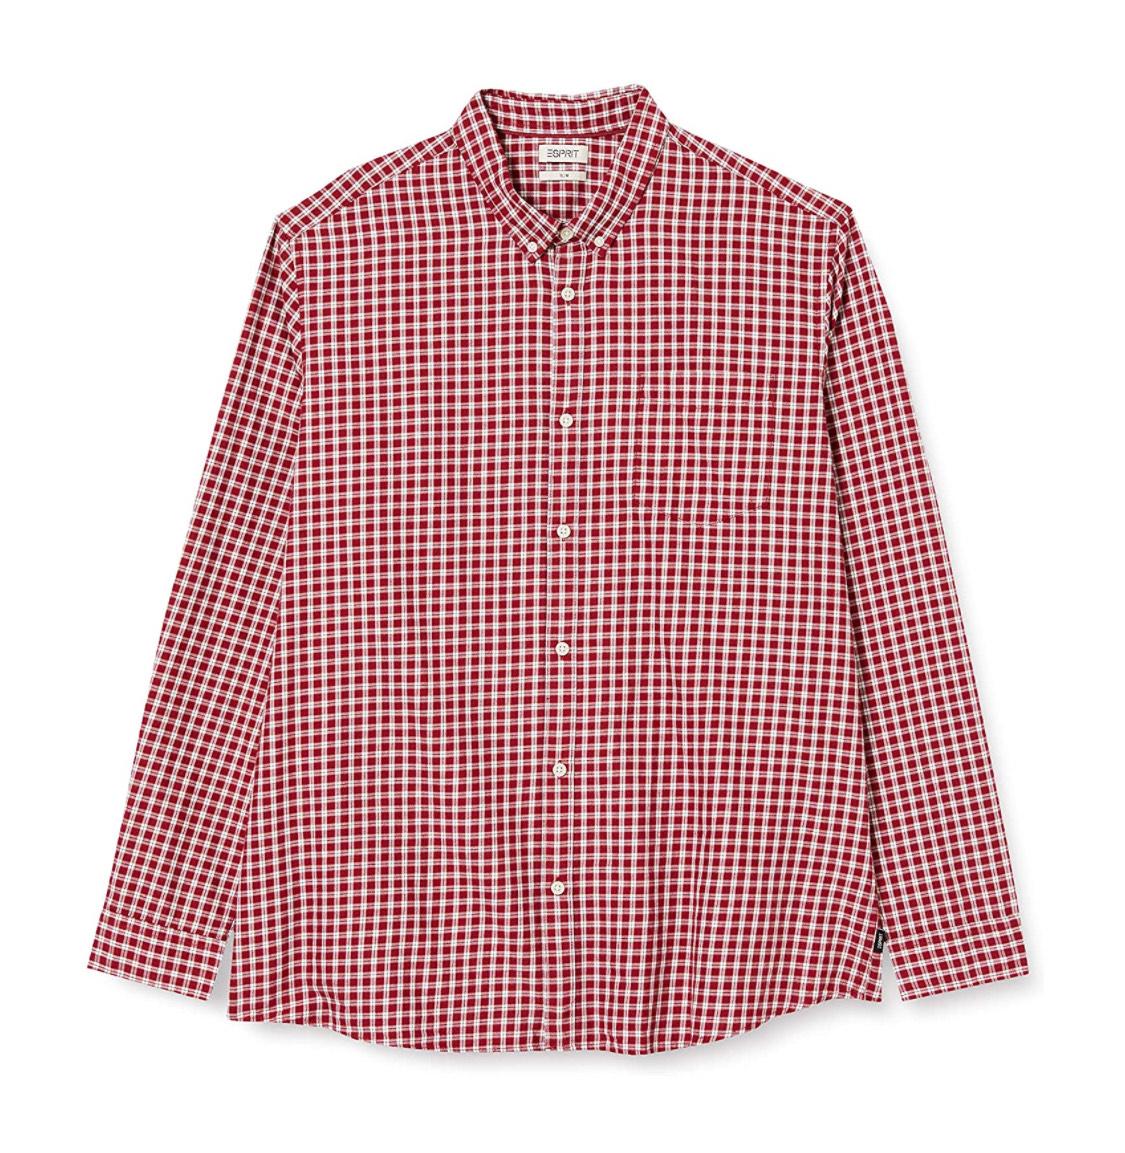 Camisa manga larga Esprit hombre talla S.